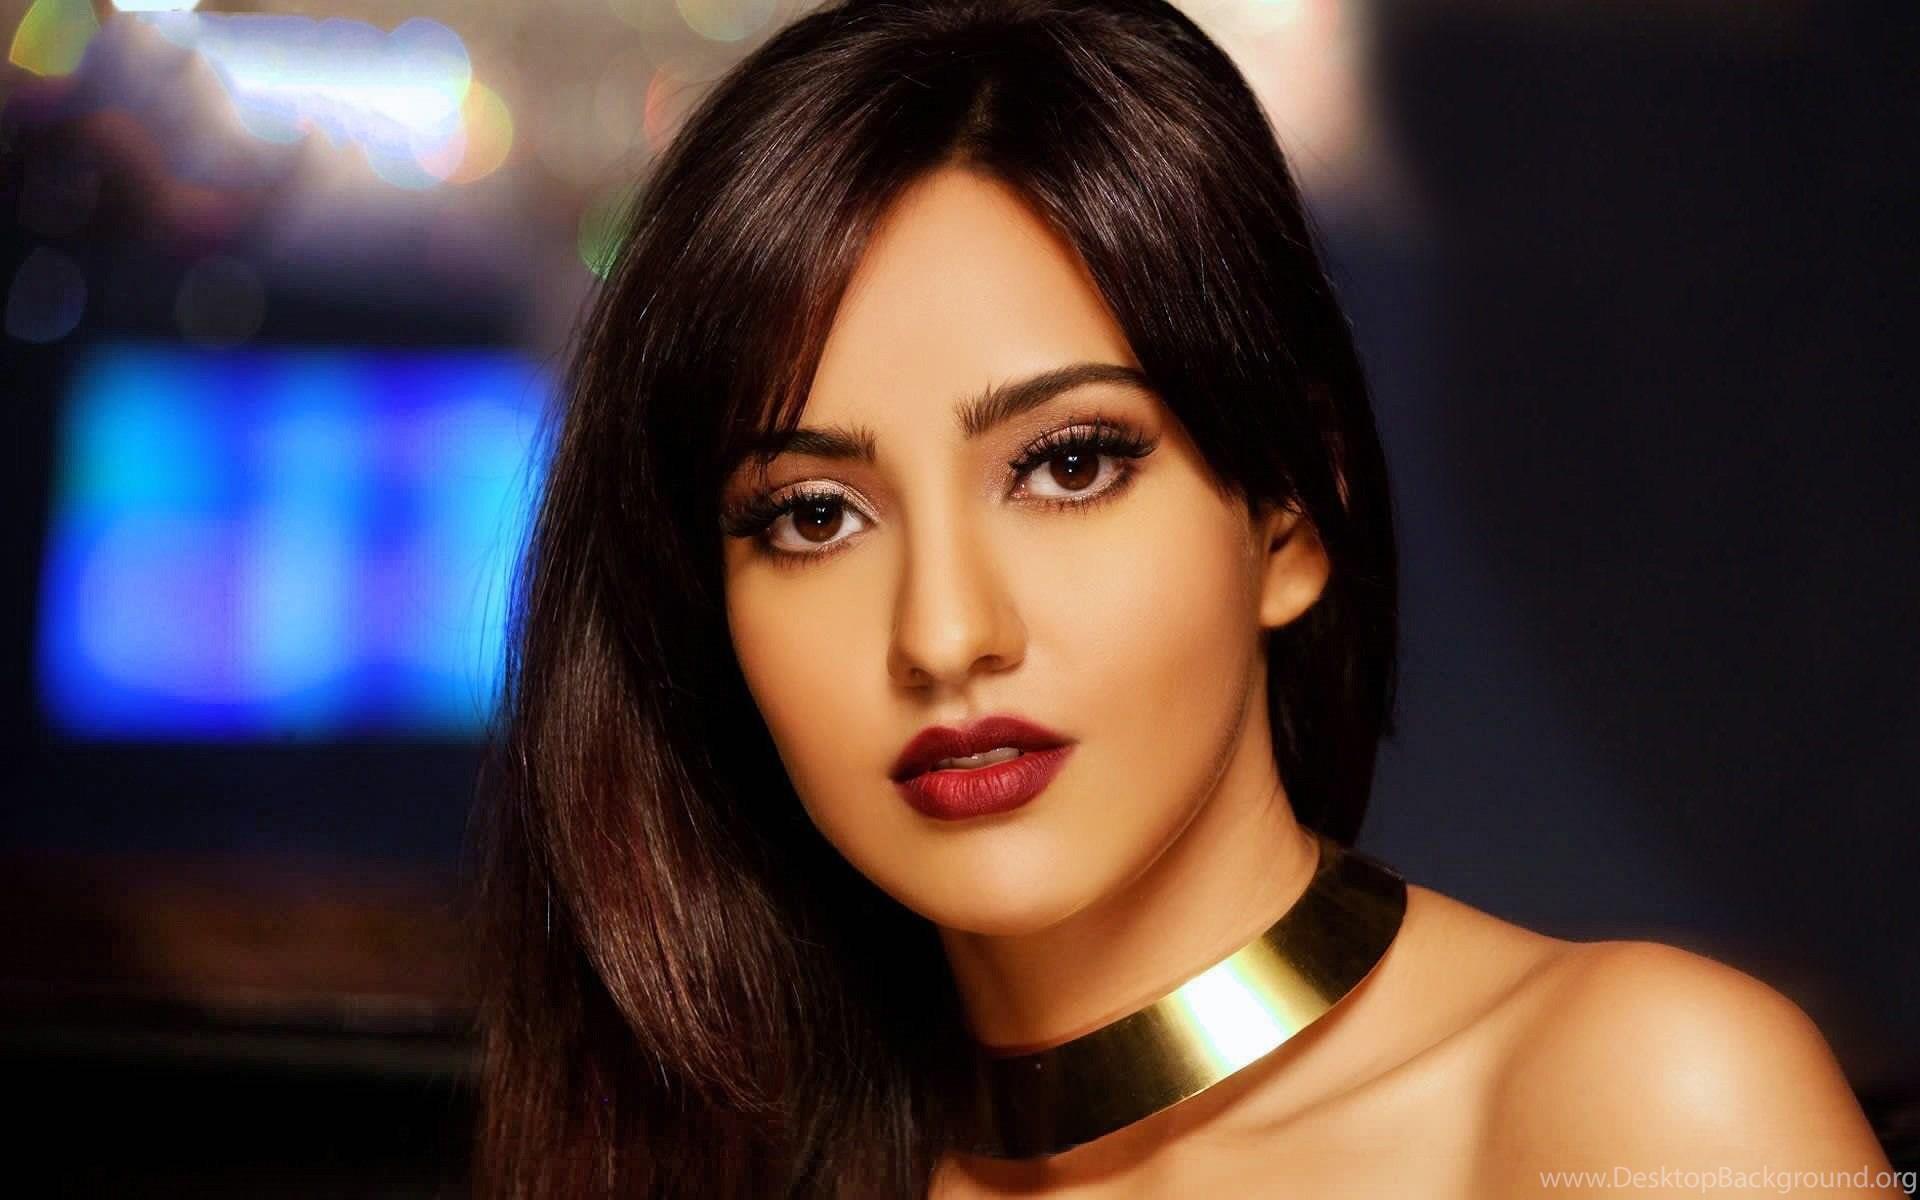 neha sharma actresses india face model indian actress hd sublime